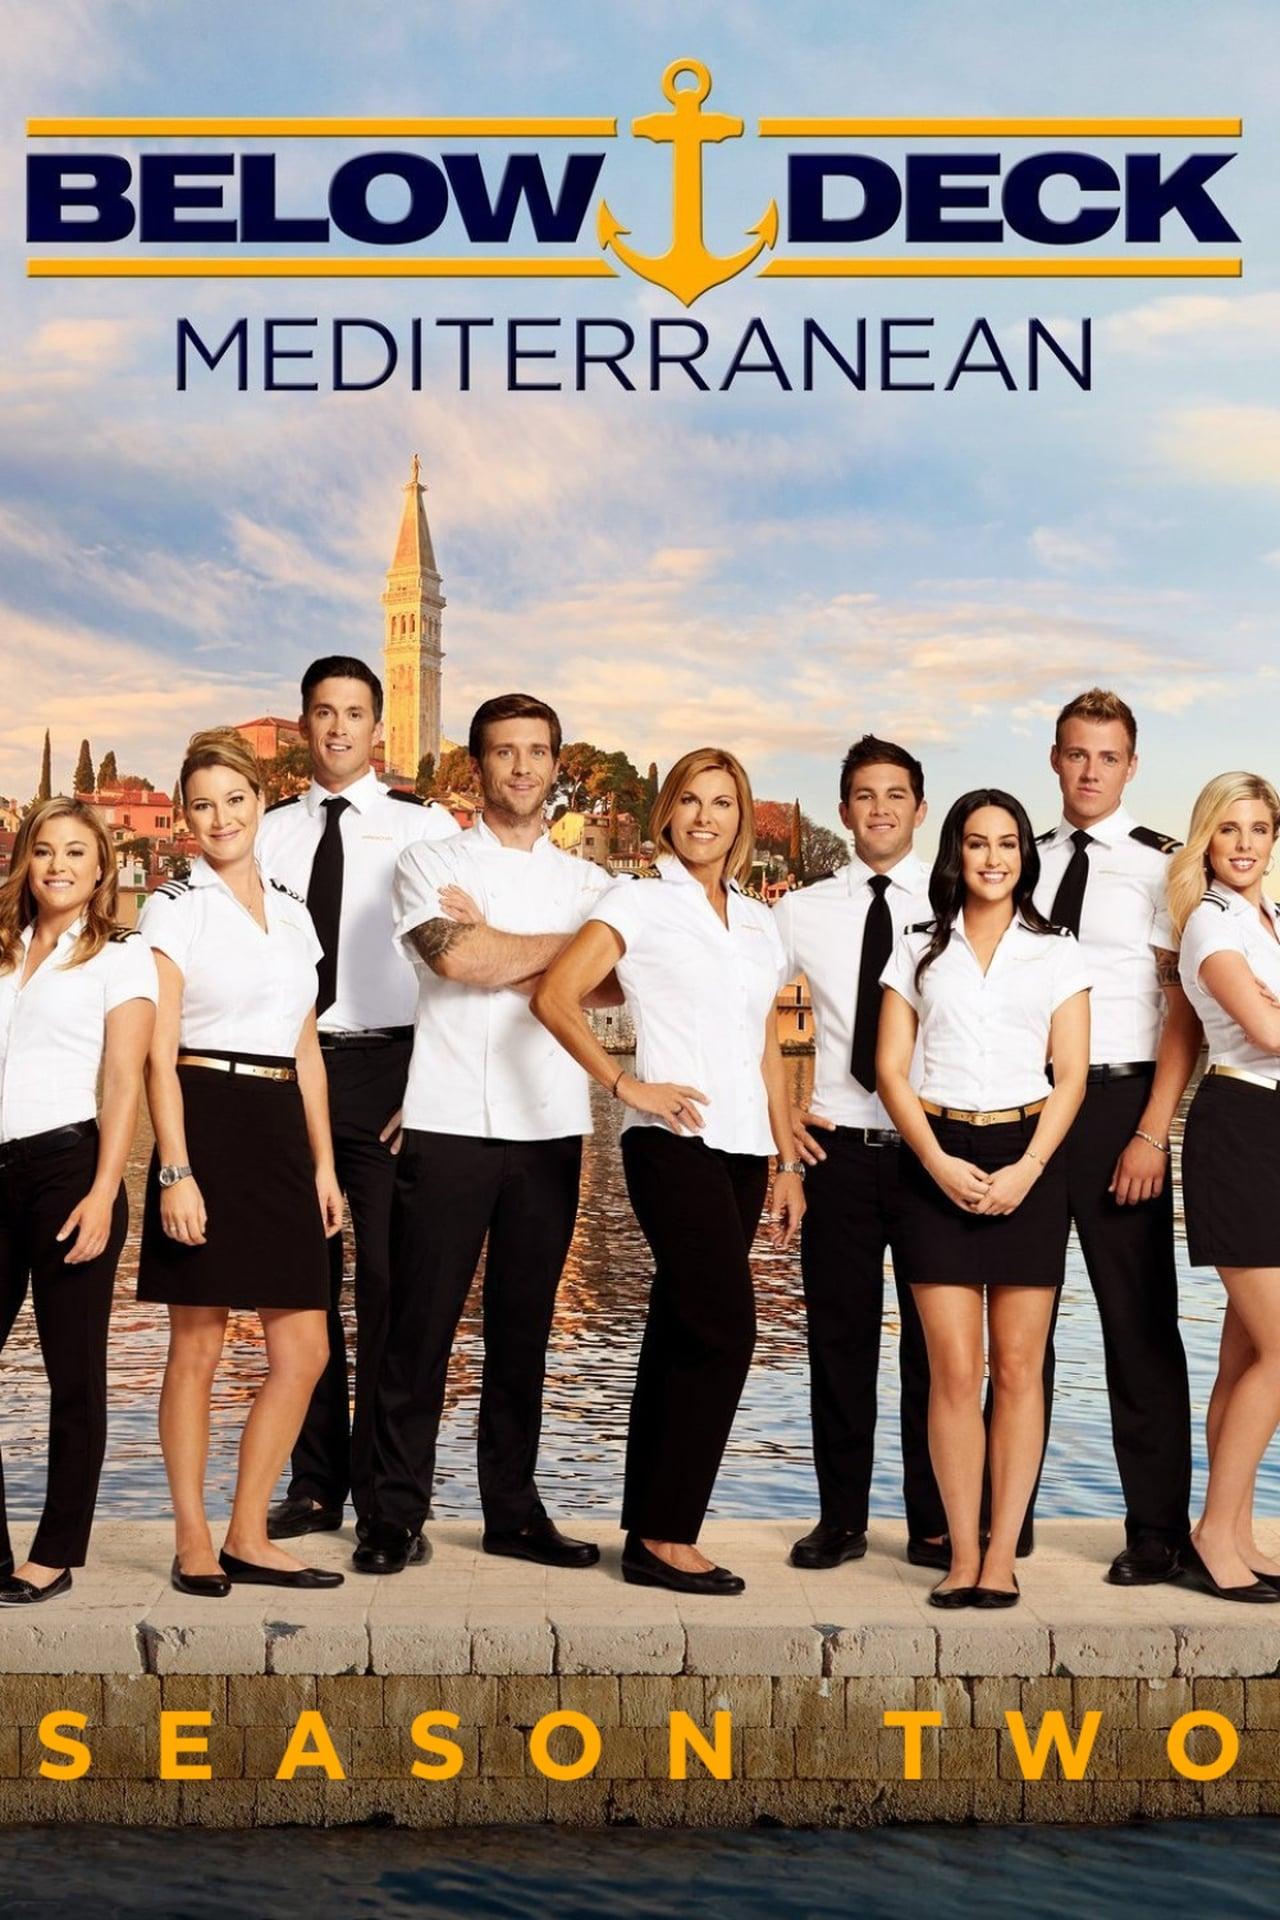 Below Deck Mediterranean Season 2